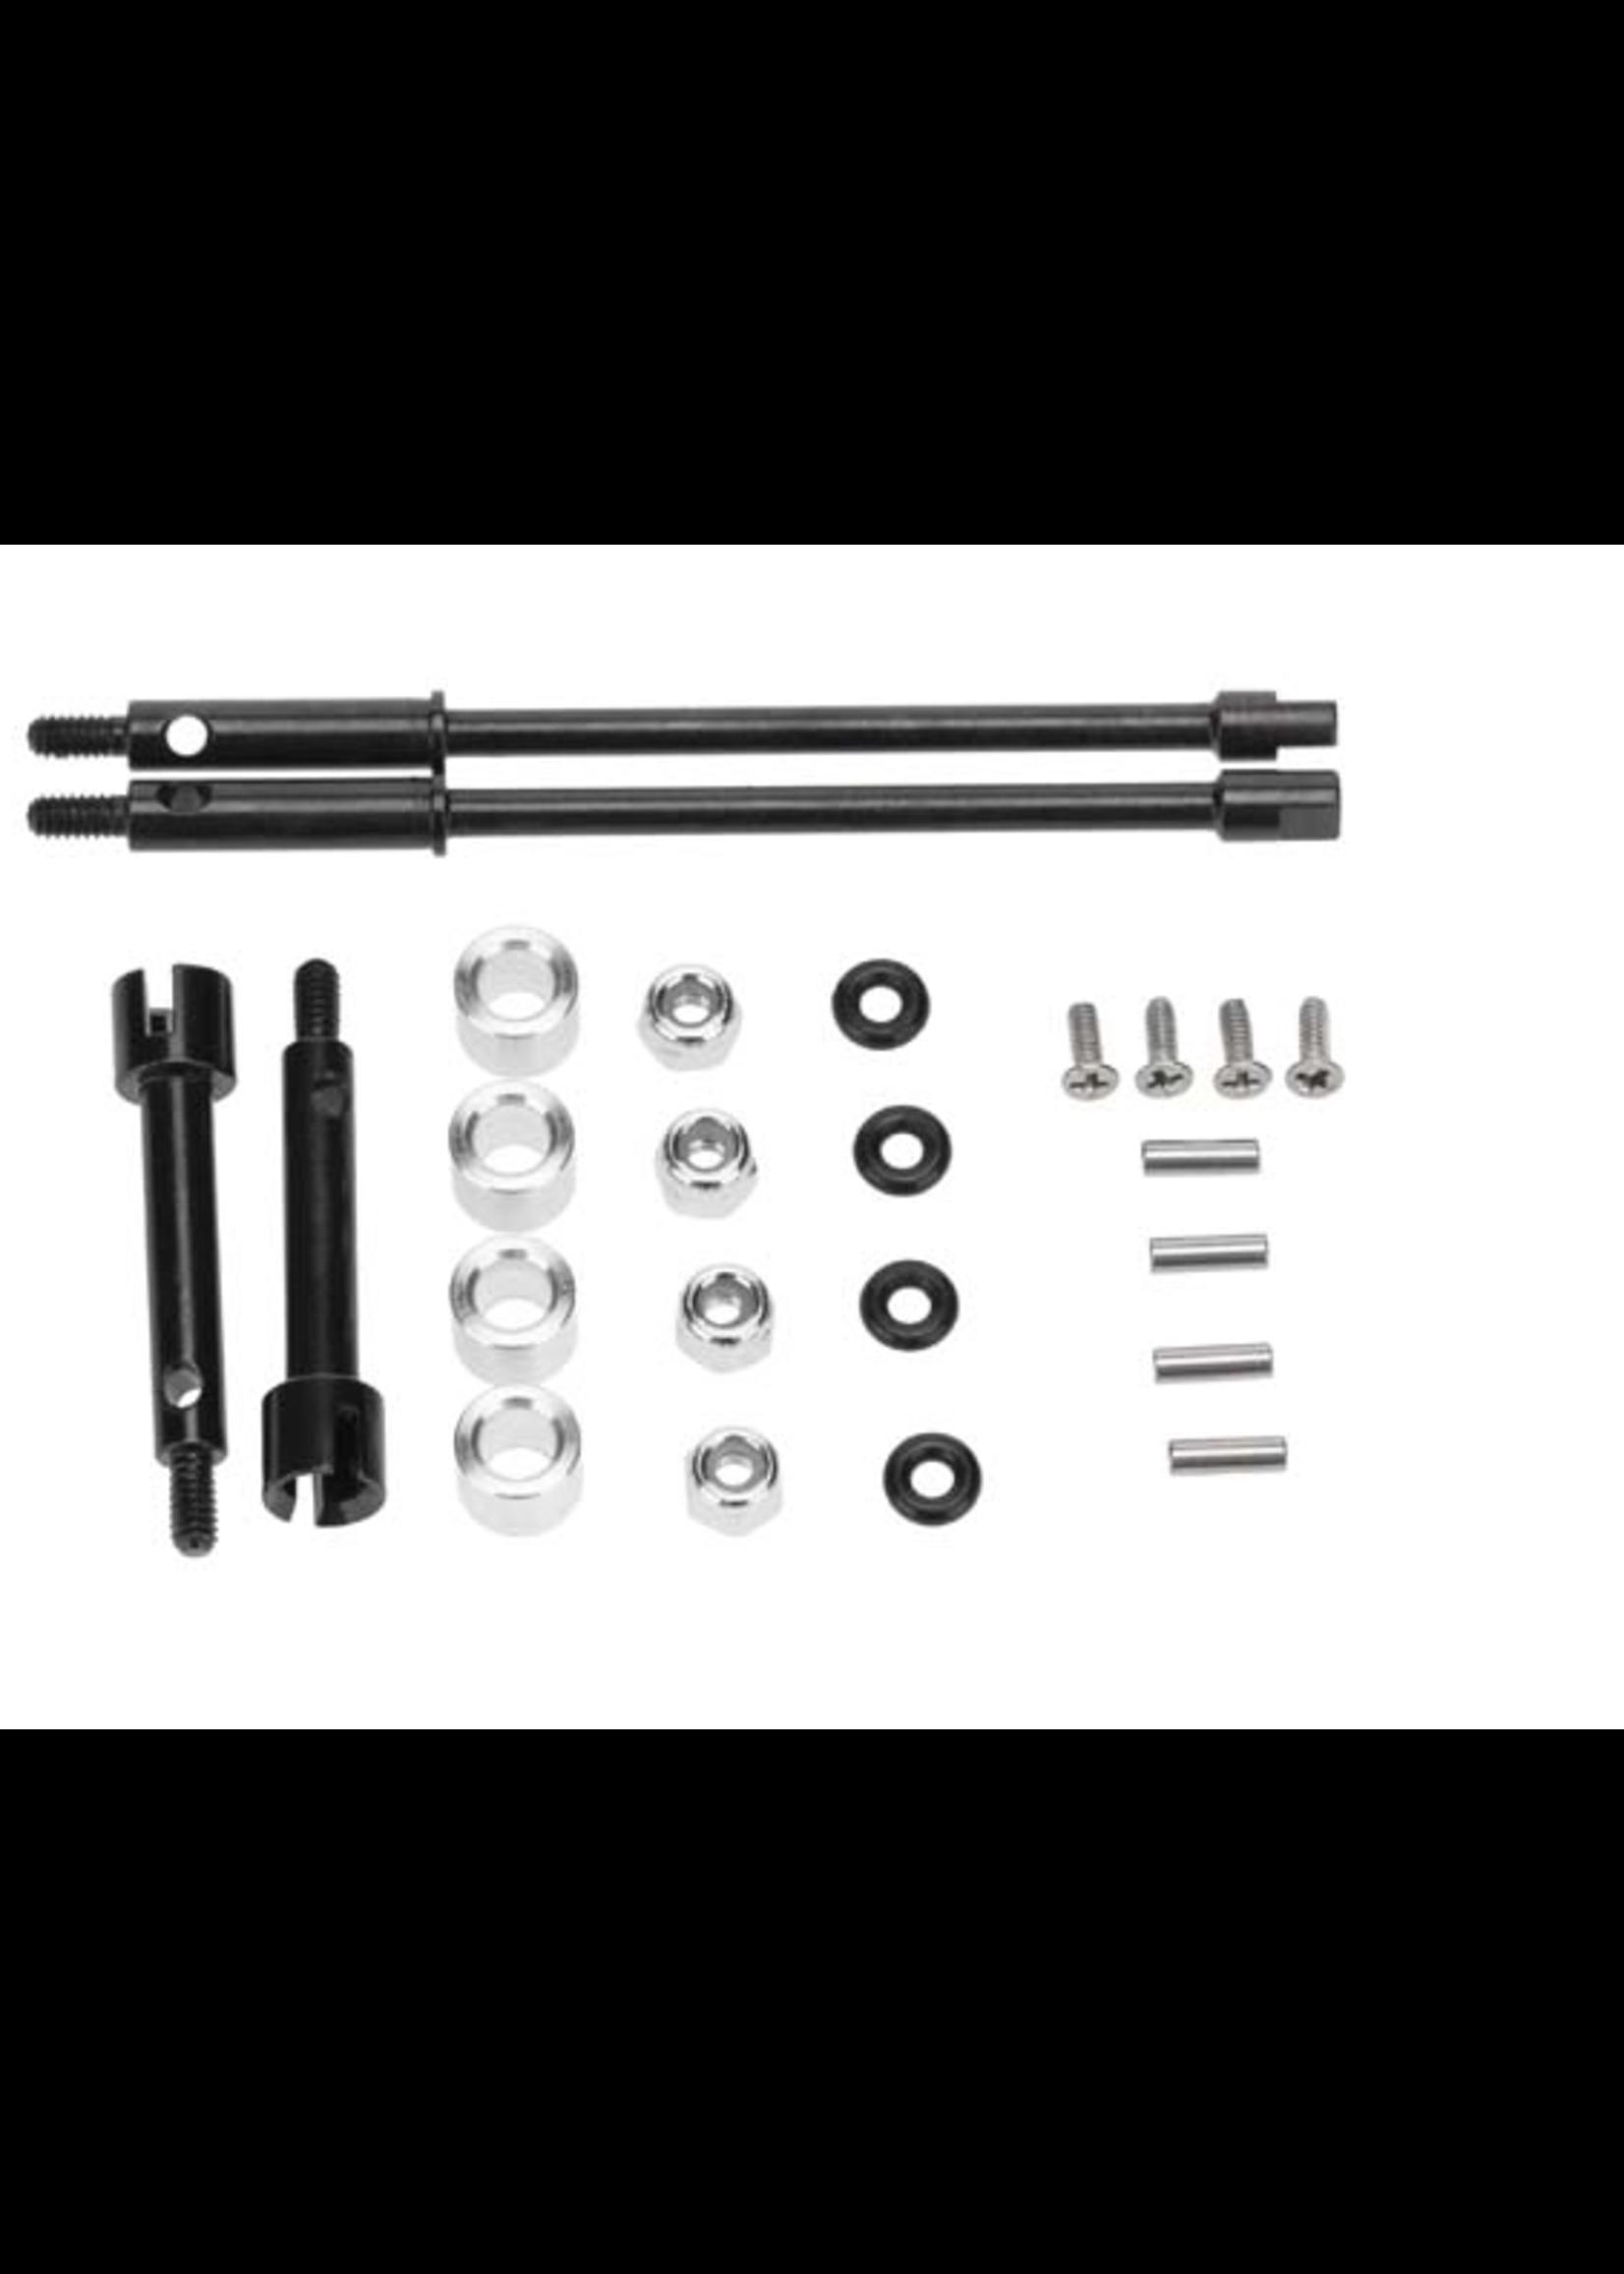 Hobby Details DTSCX24-27 Hobby Details Axial SCX24 +4mm Steel Drive Stub Axles